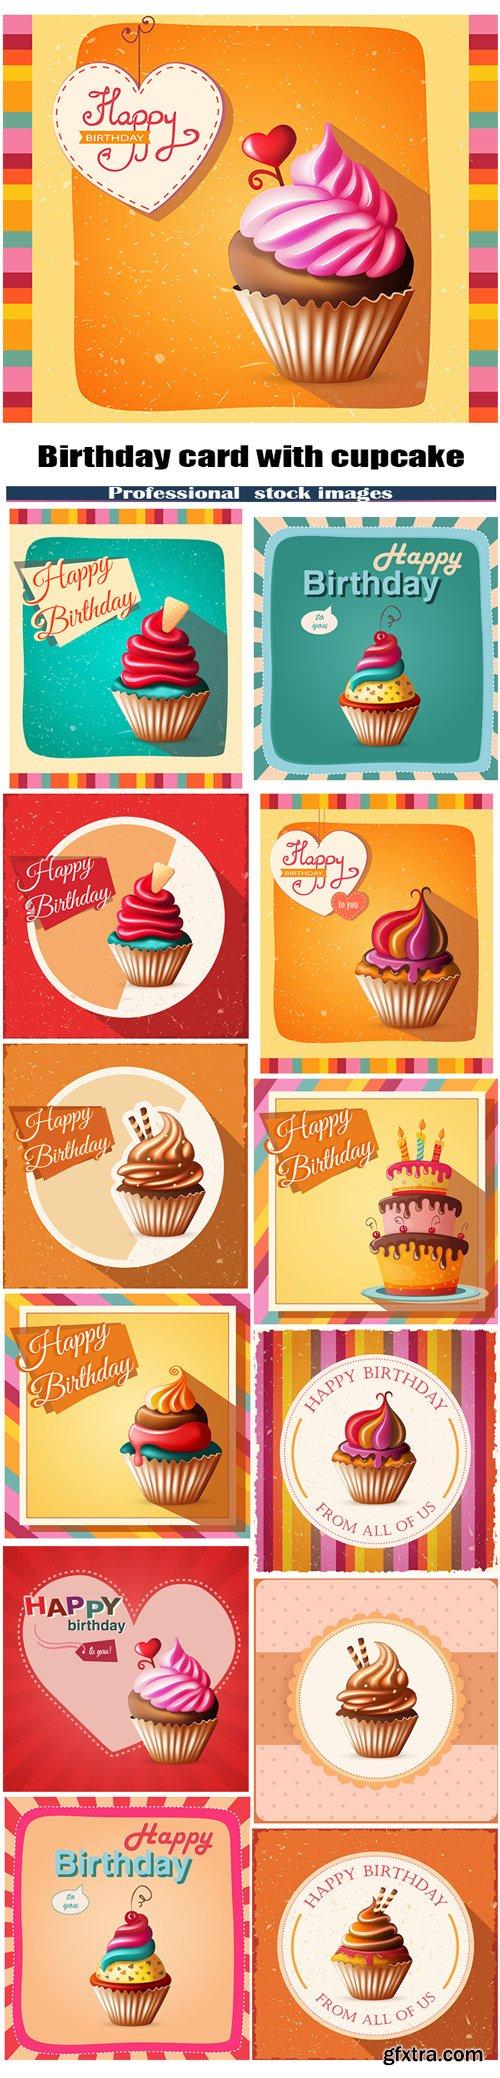 Birthday card with cupcake